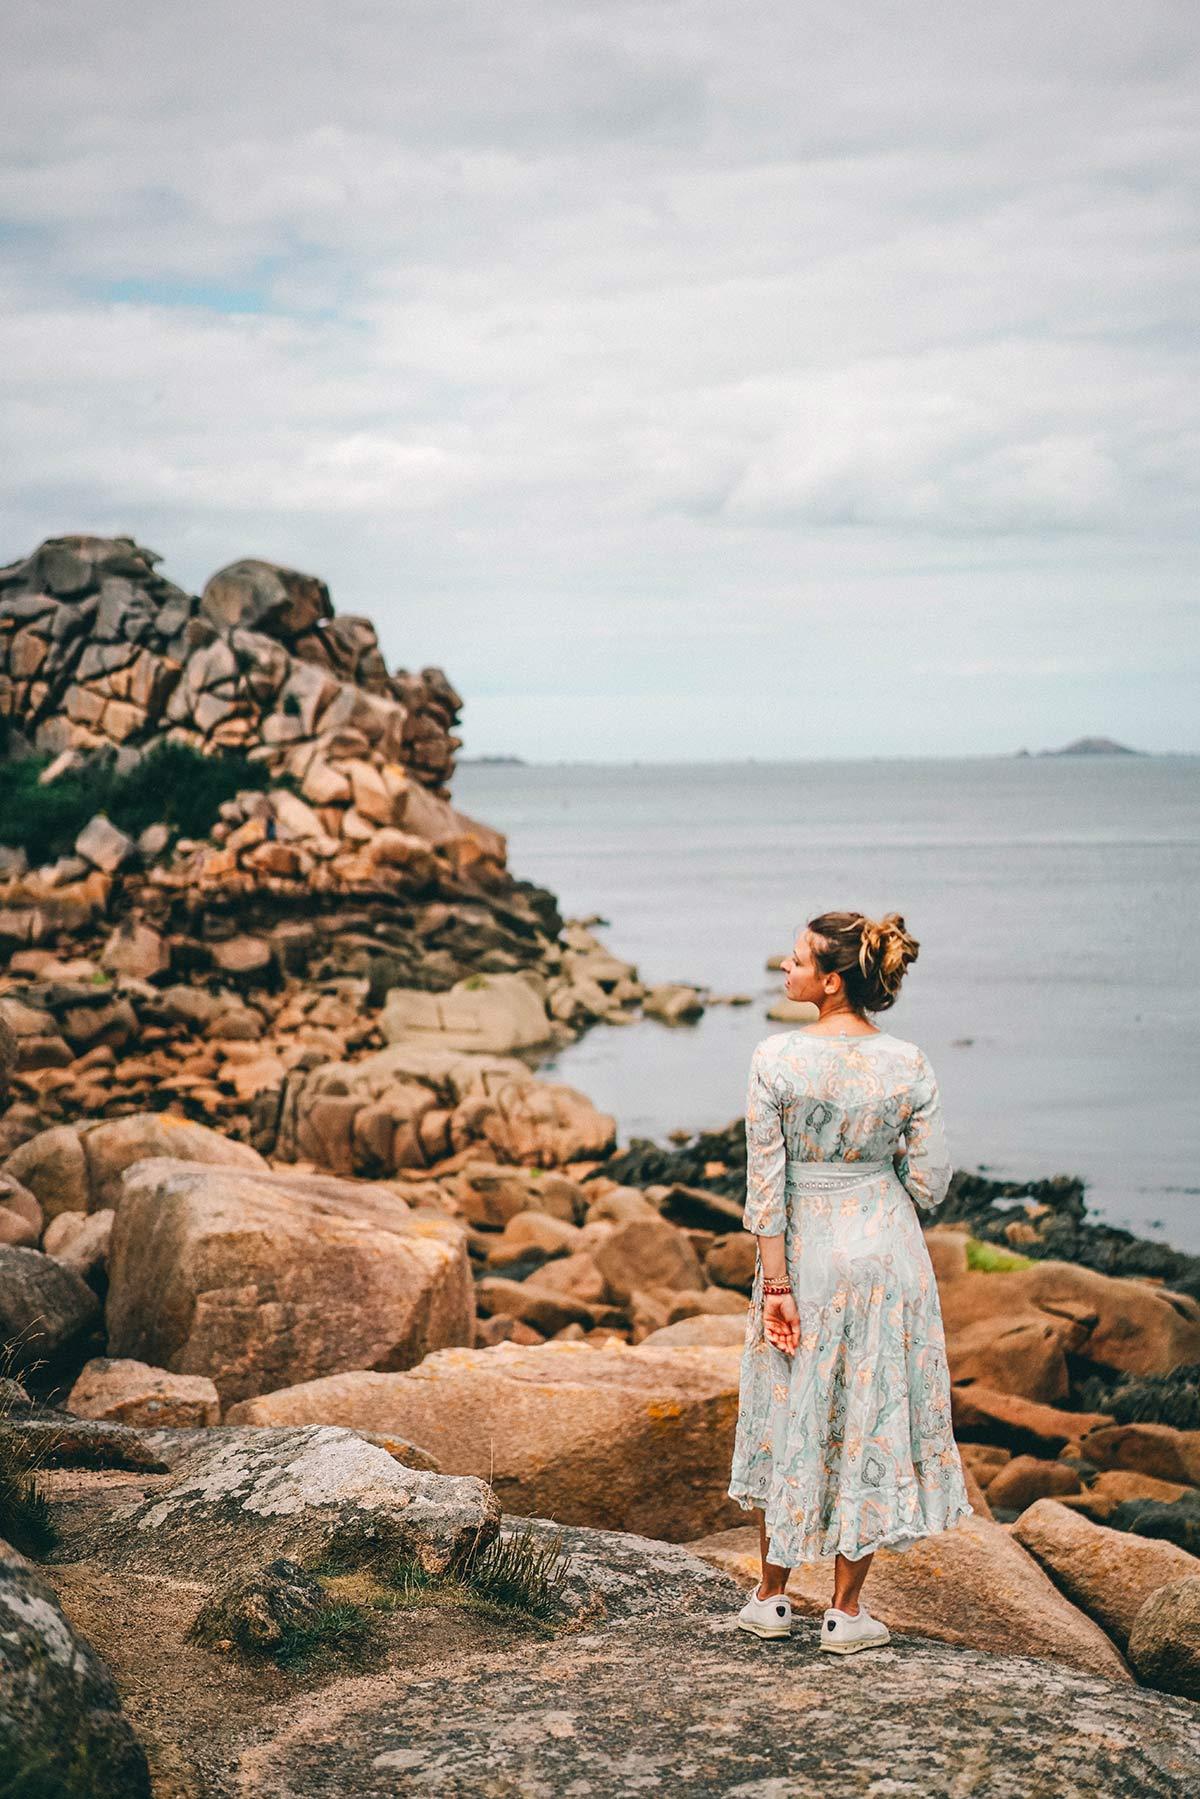 Die Rosa Granitküste in der Bretagne